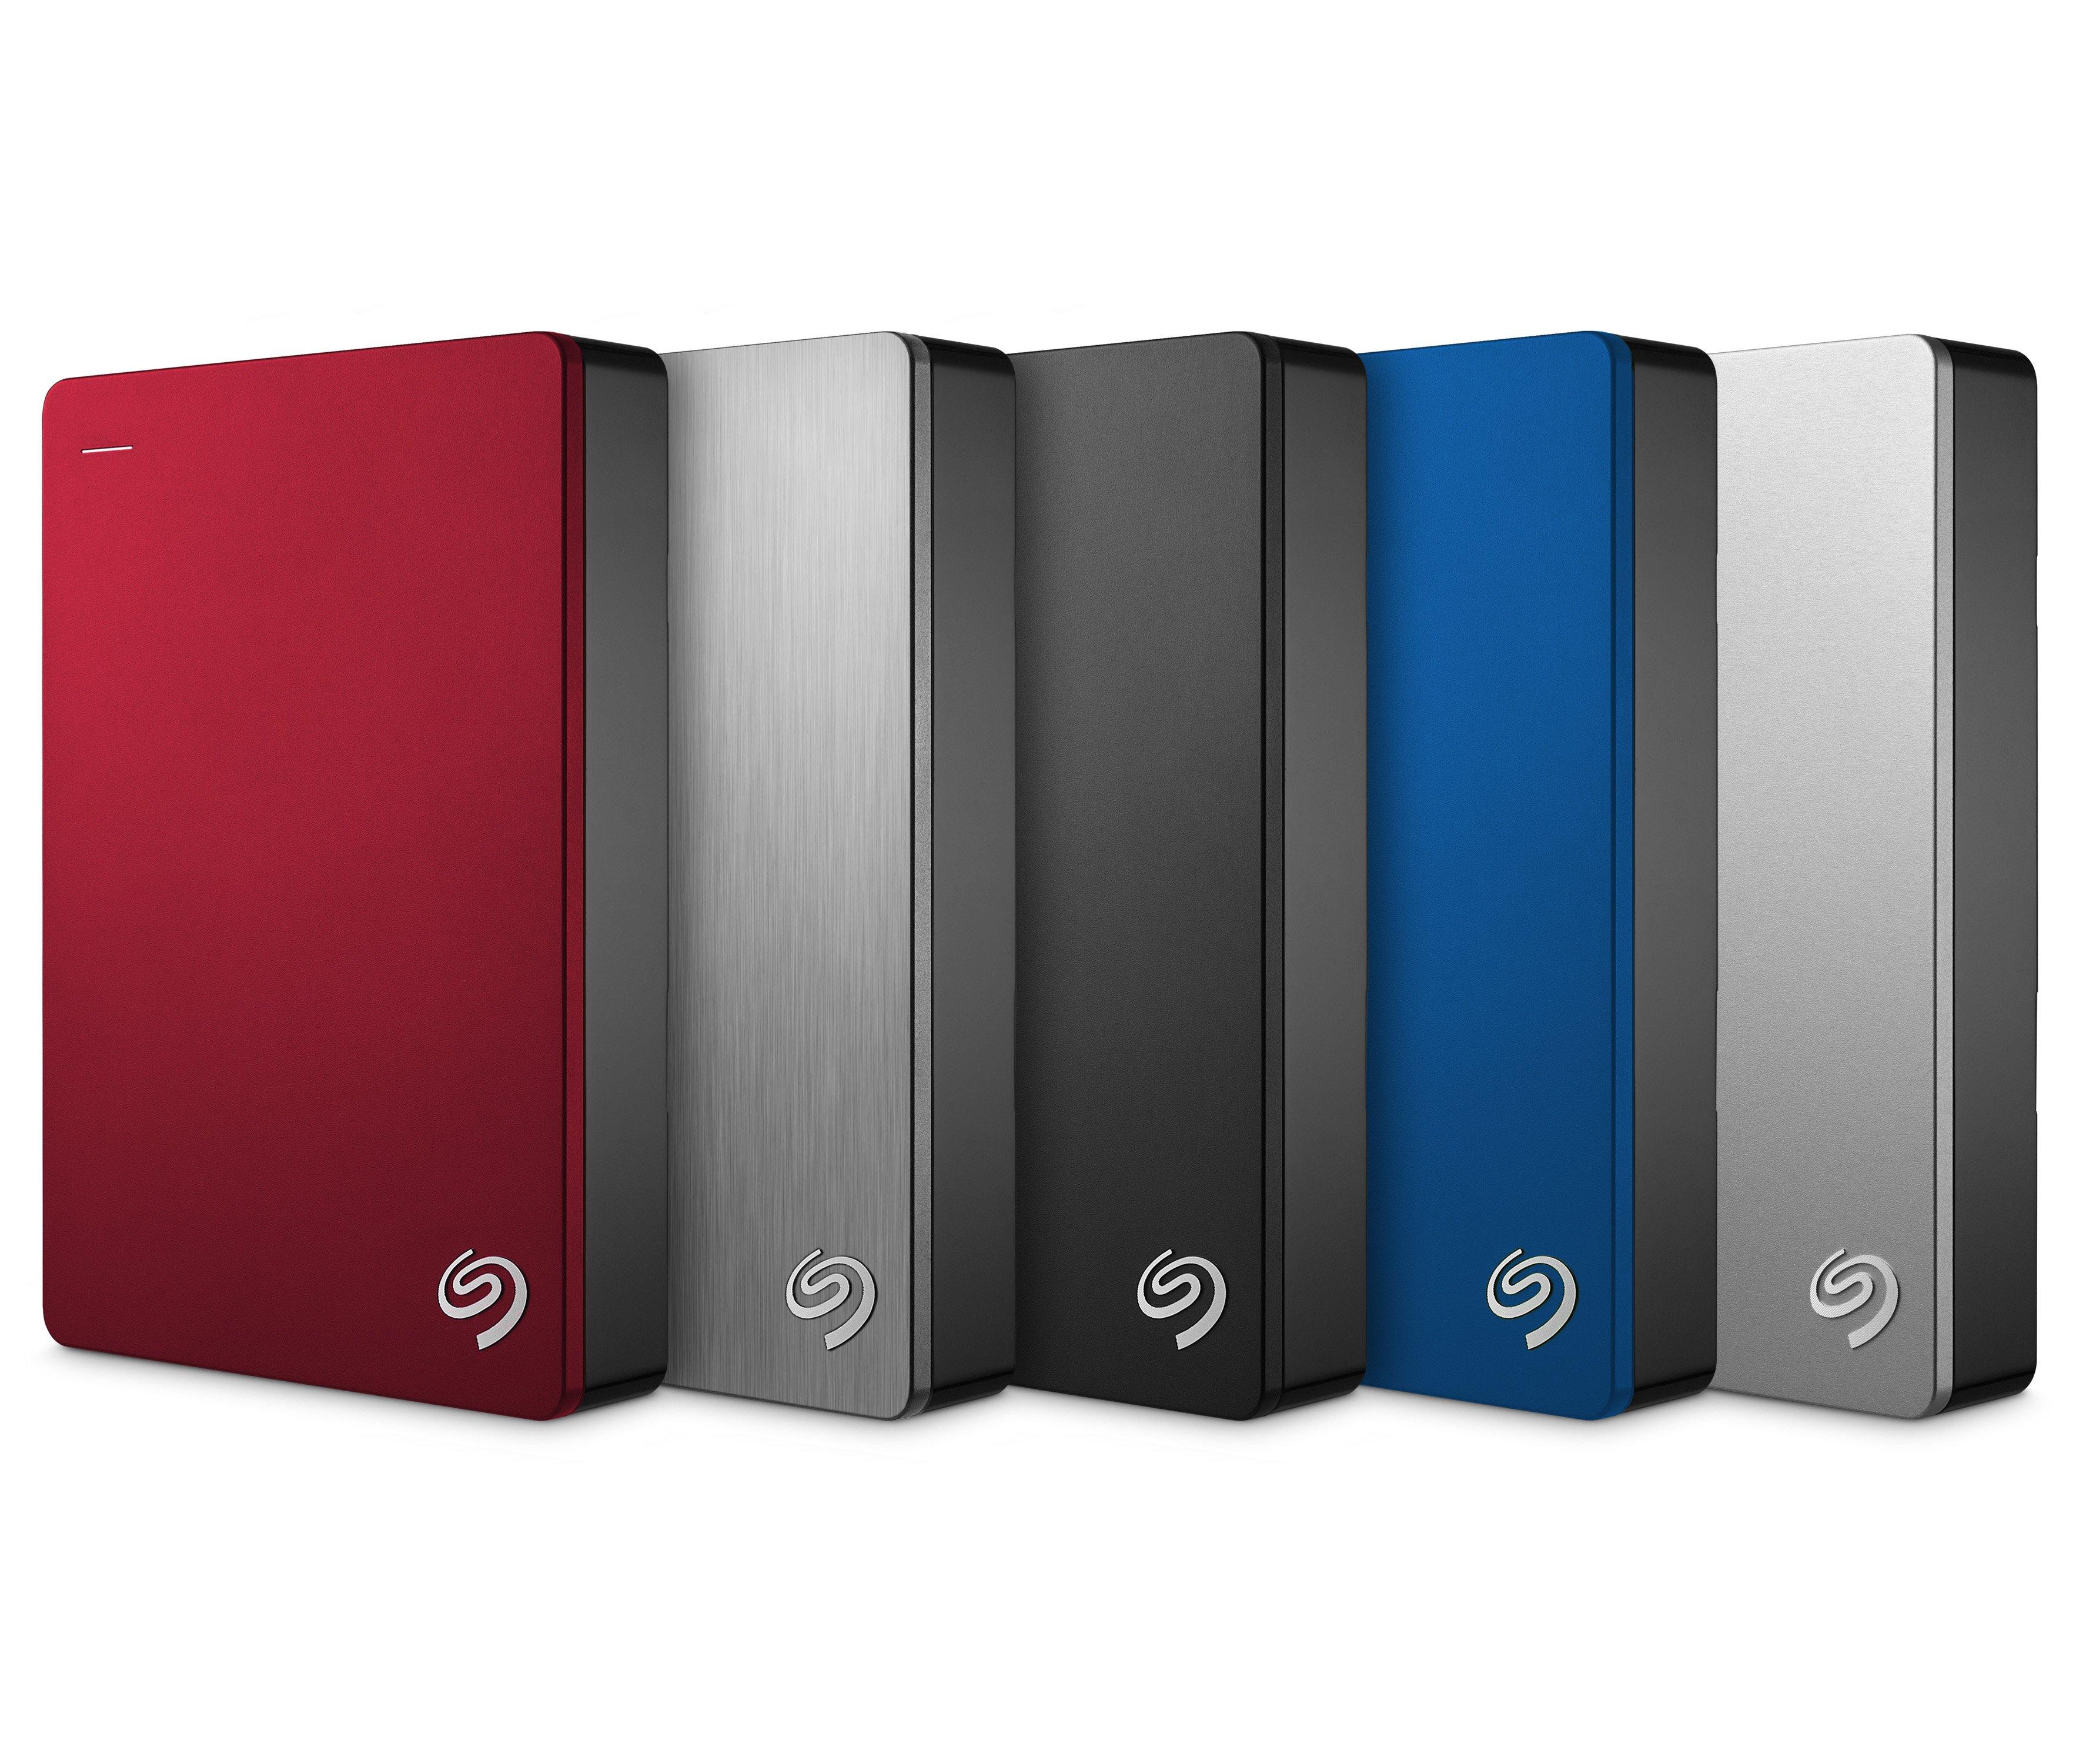 bup-portable-5tb-family-wmac-hi-res